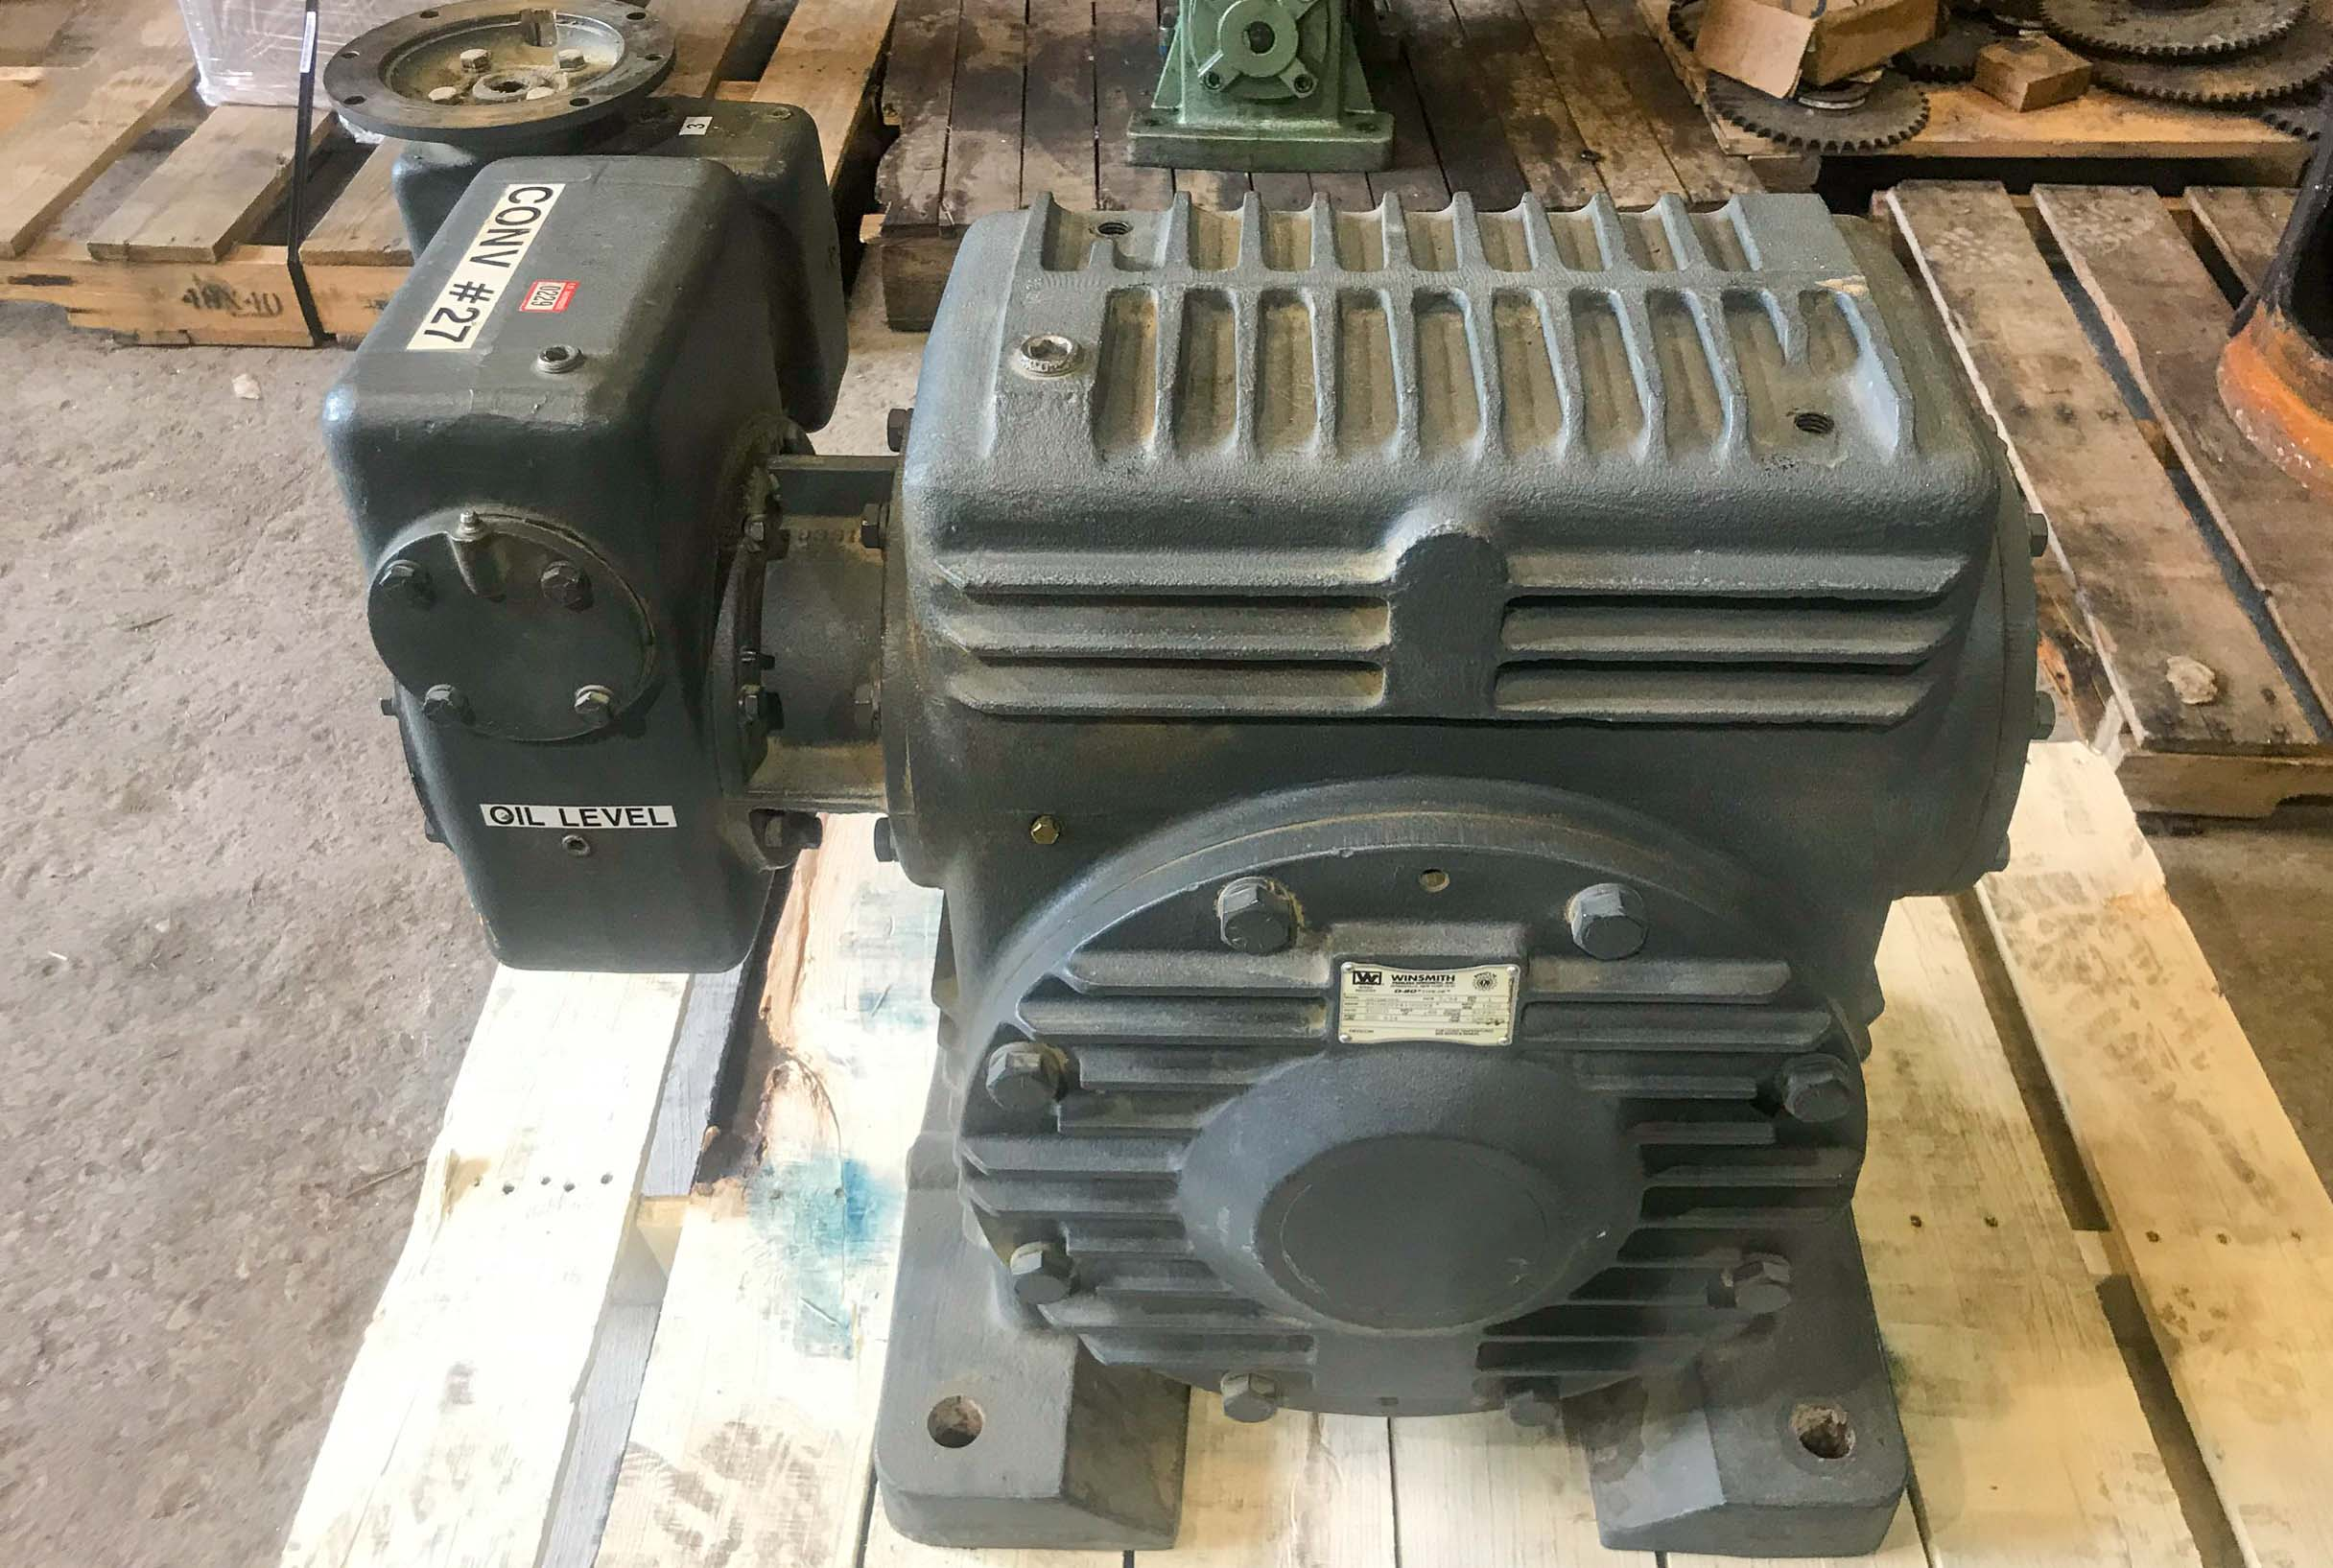 Winsmith-geardrive-1